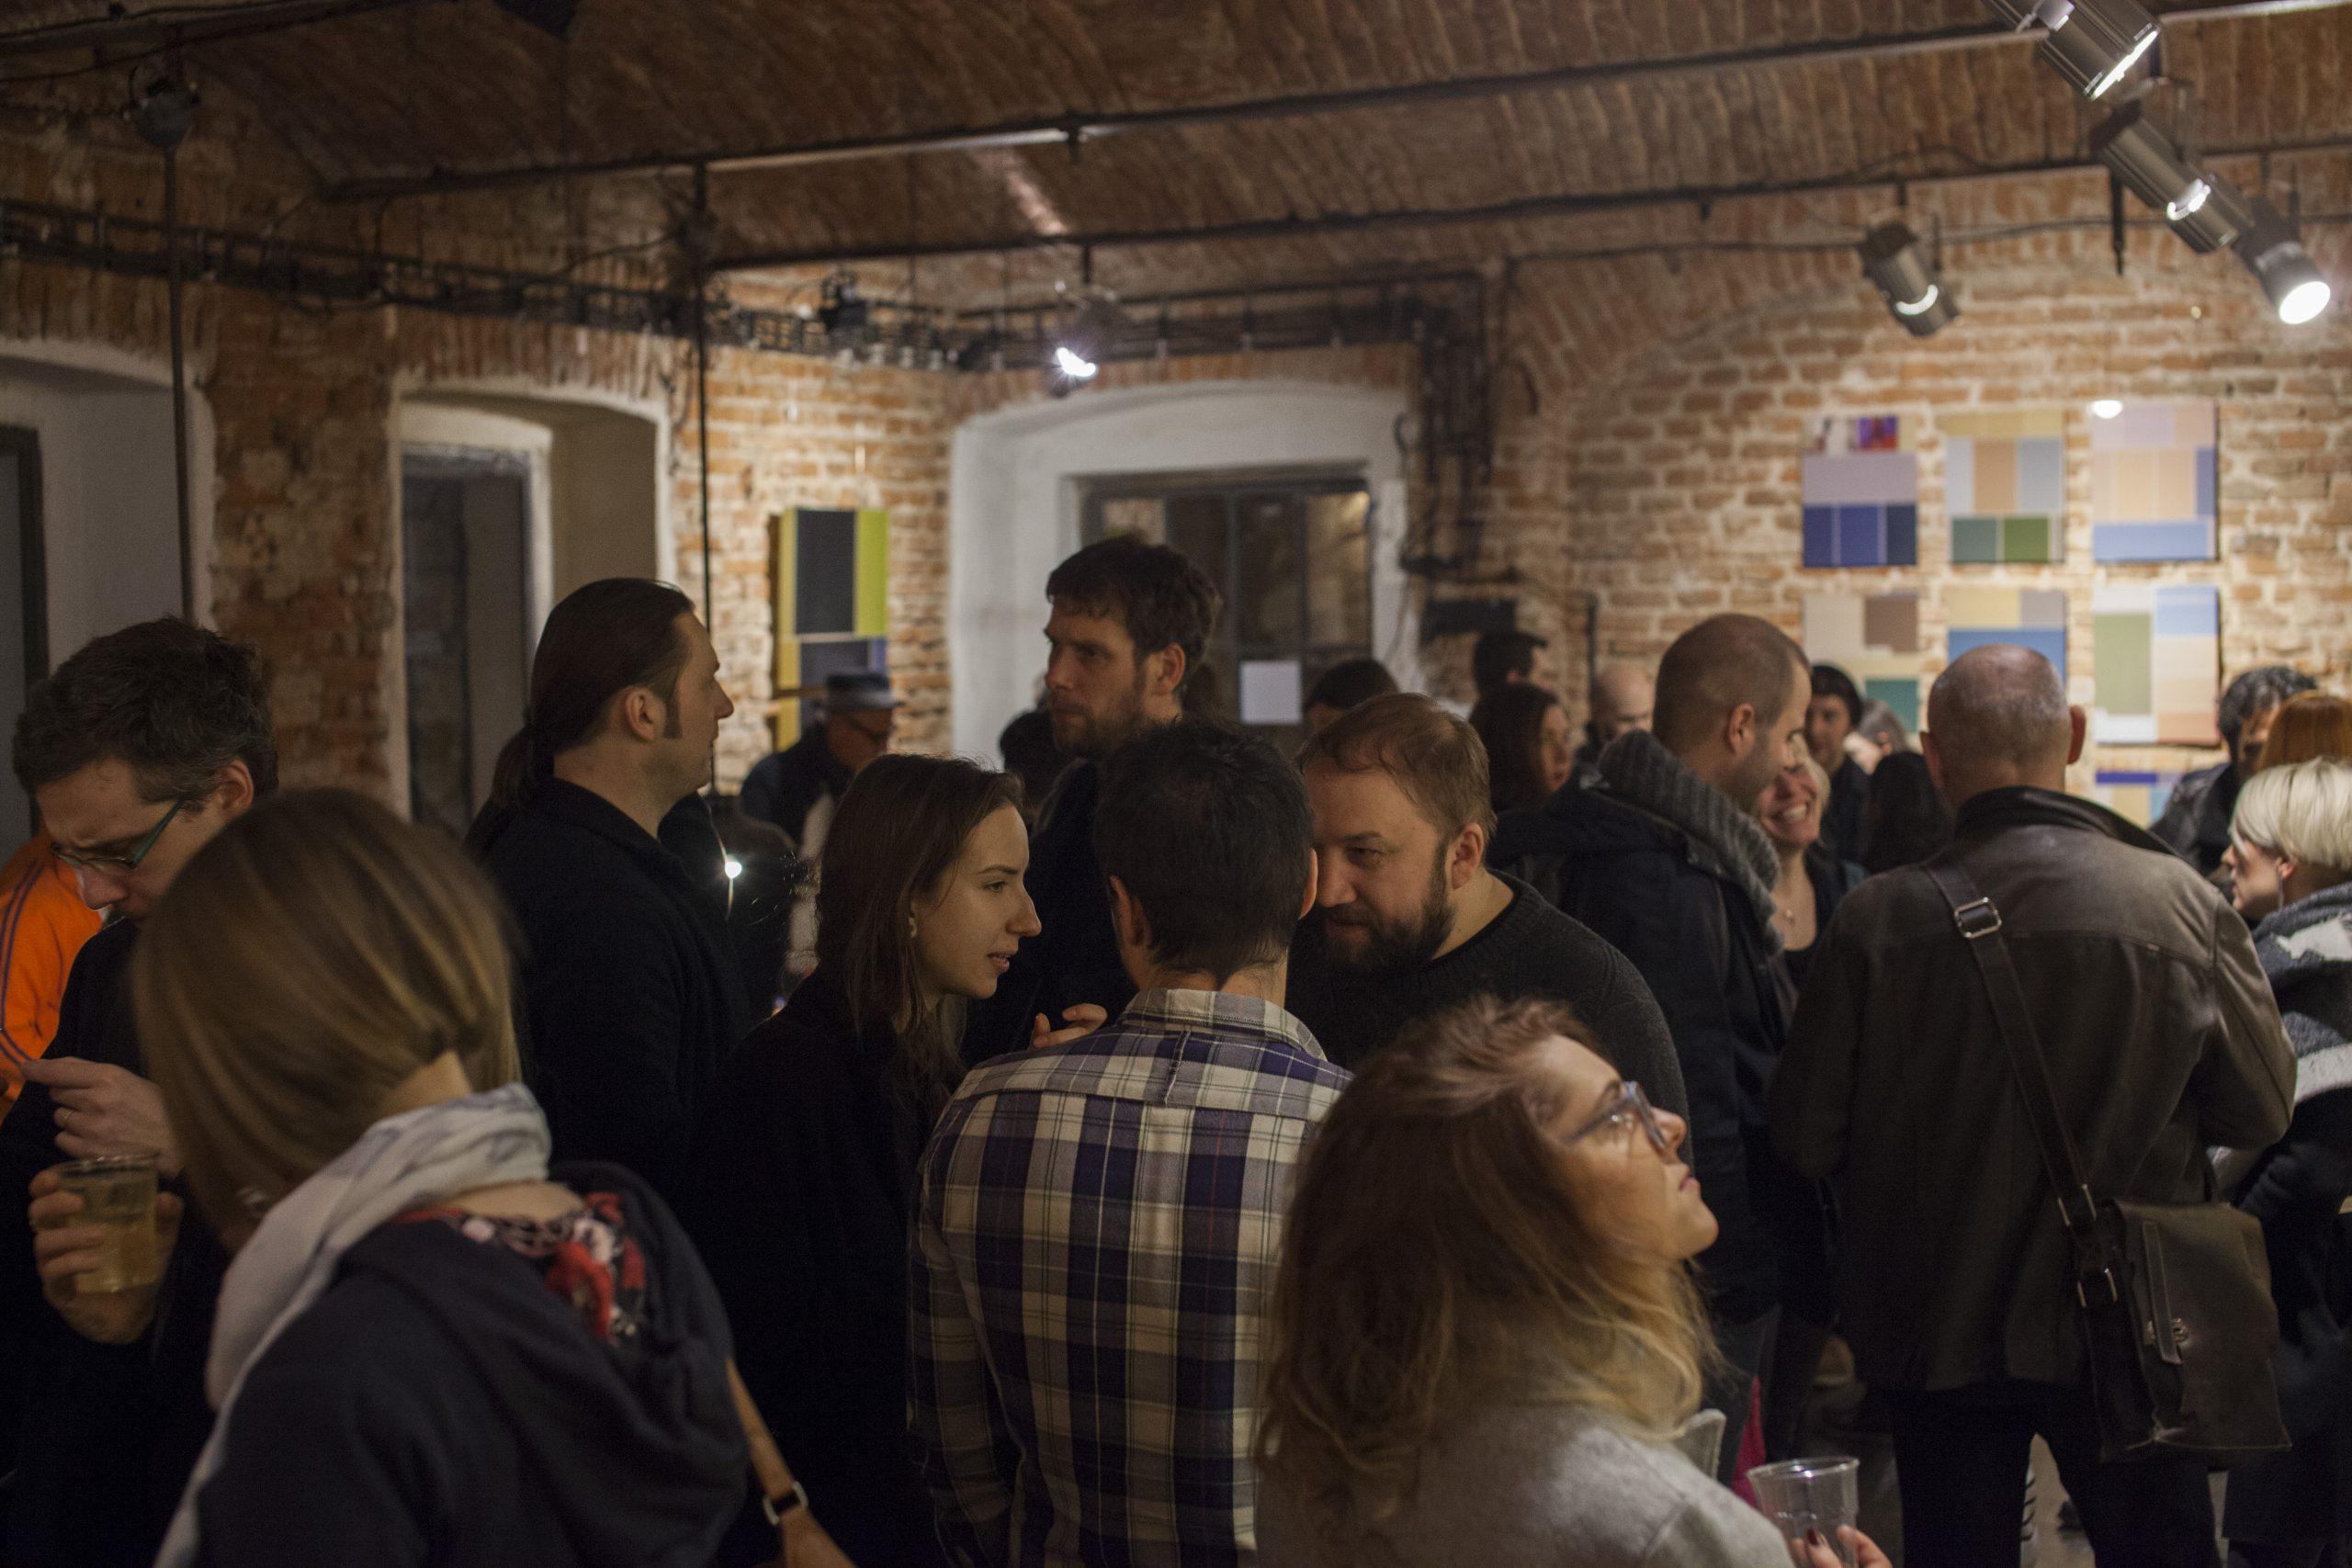 Jan Dyntera opening at Fotografic gallery